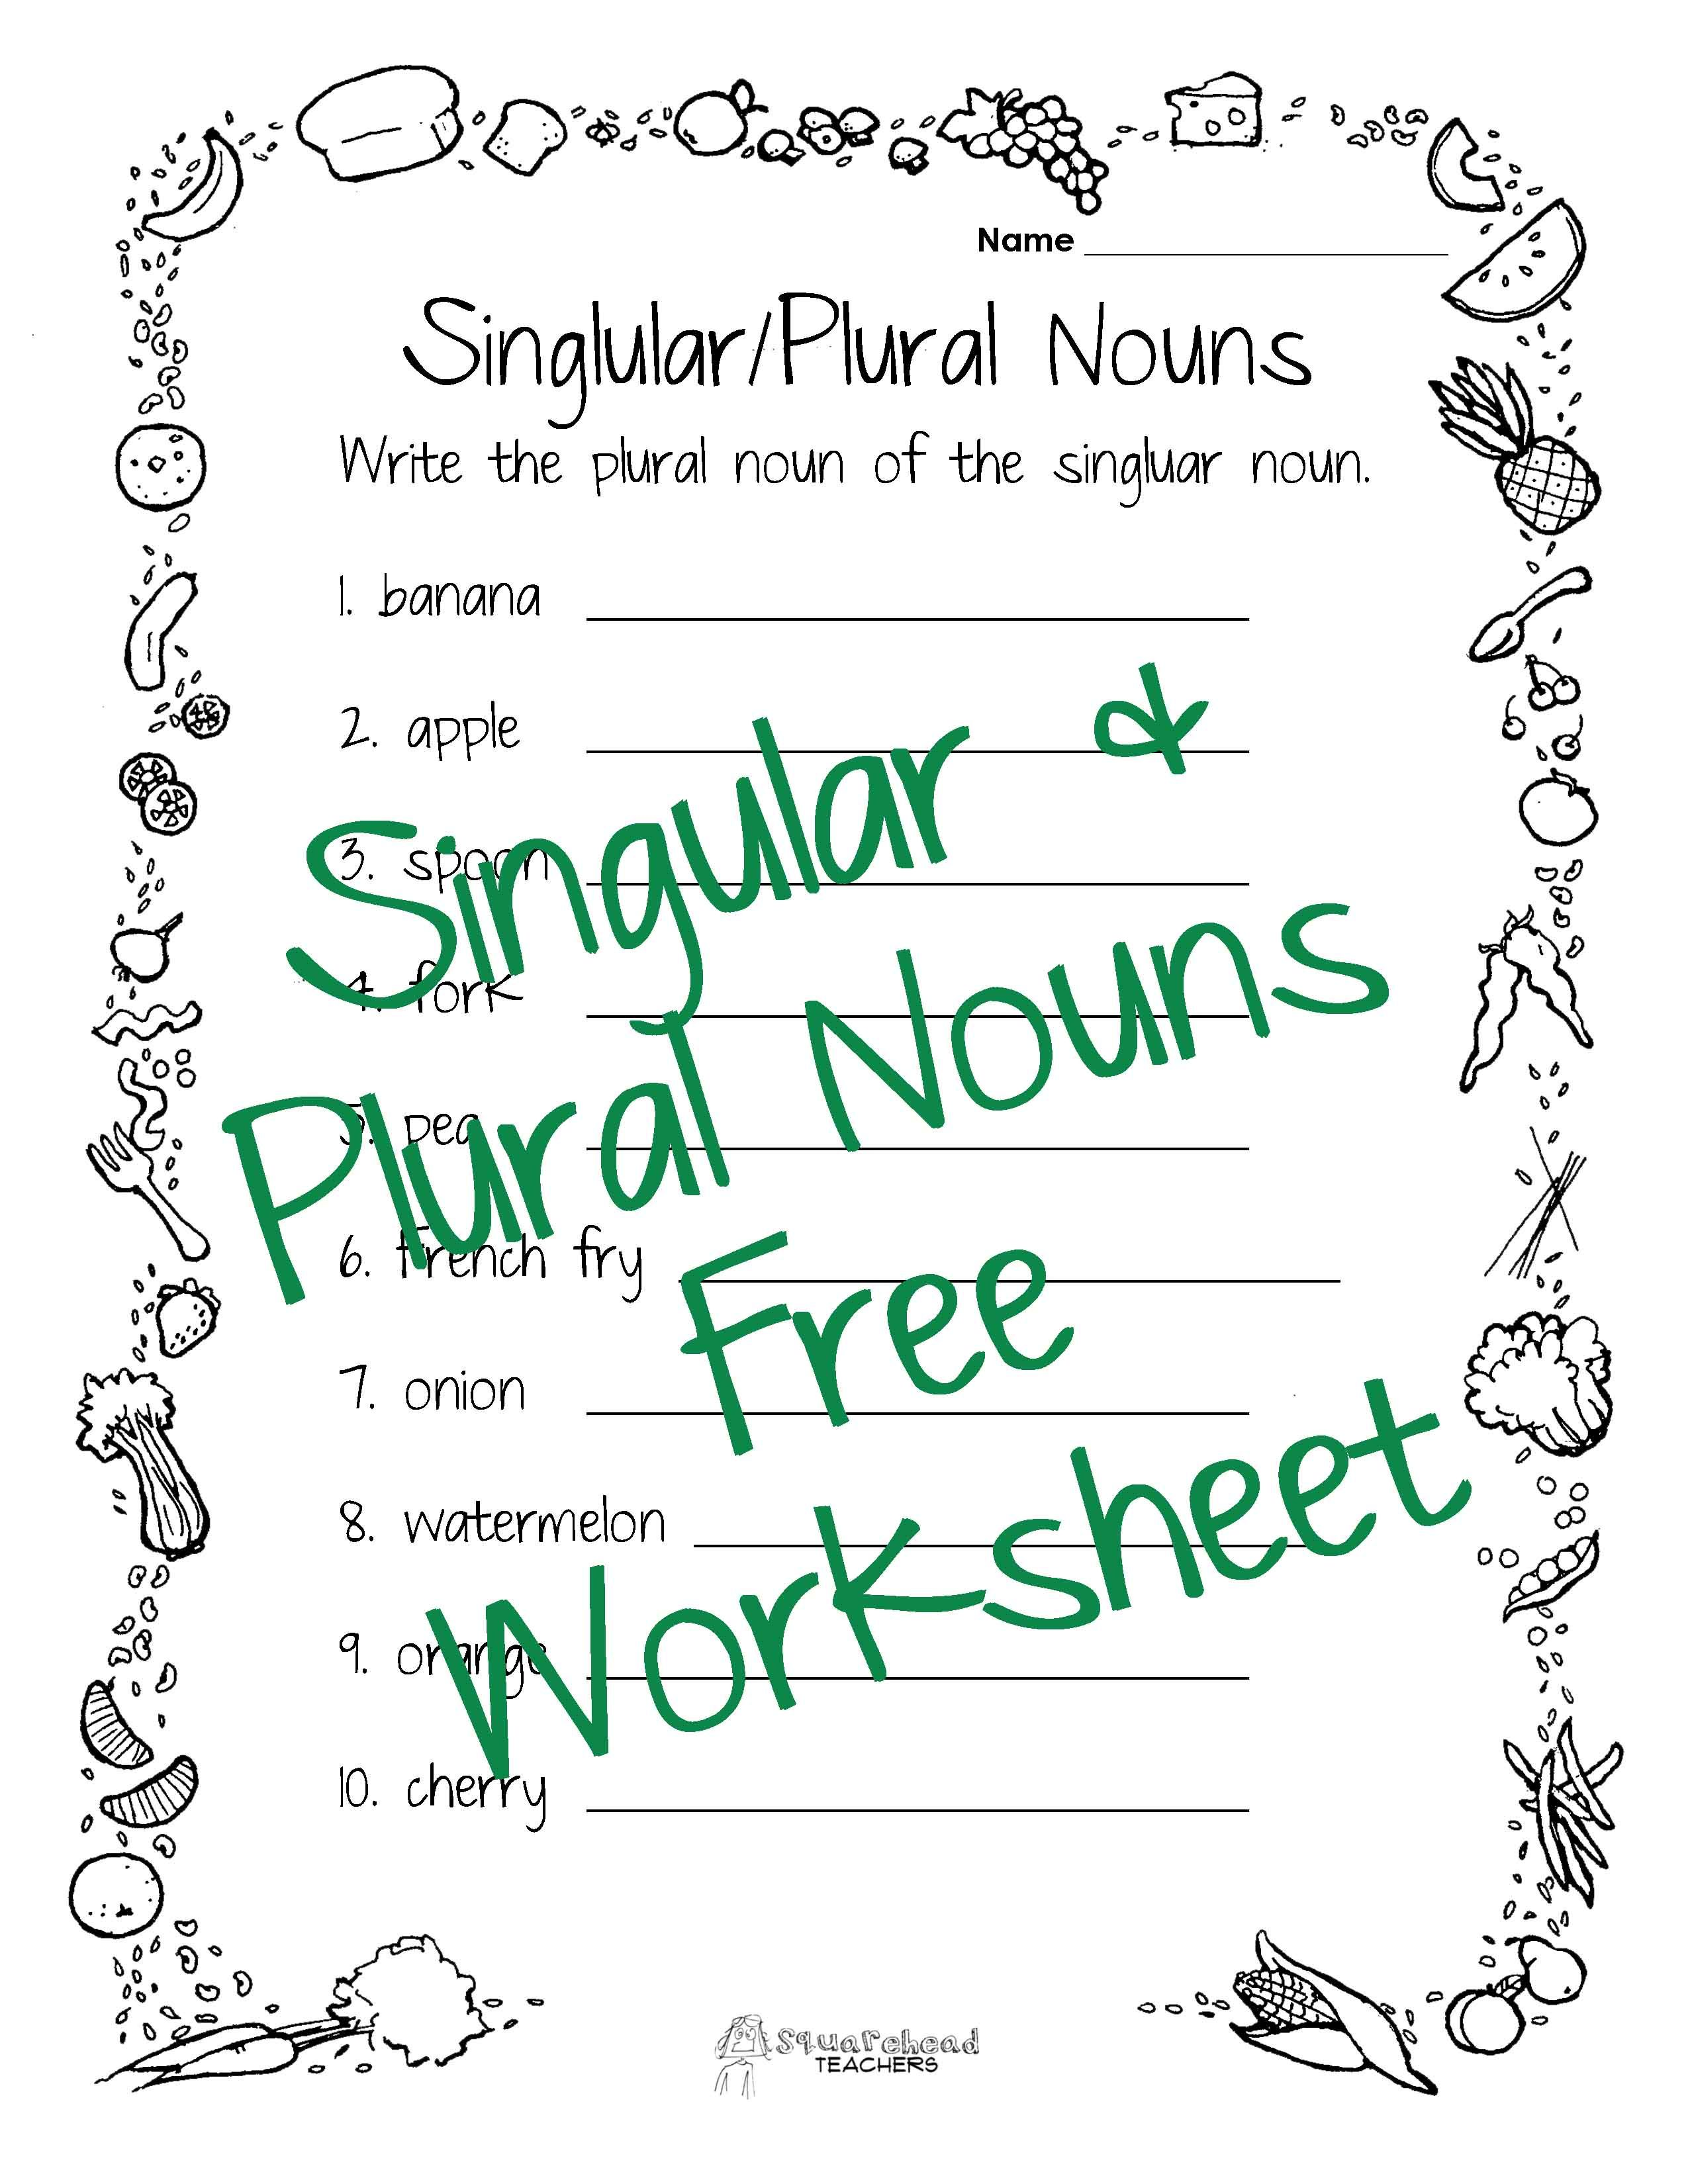 Squarehead Teachers Singular Plural Nouns Worksheet Free